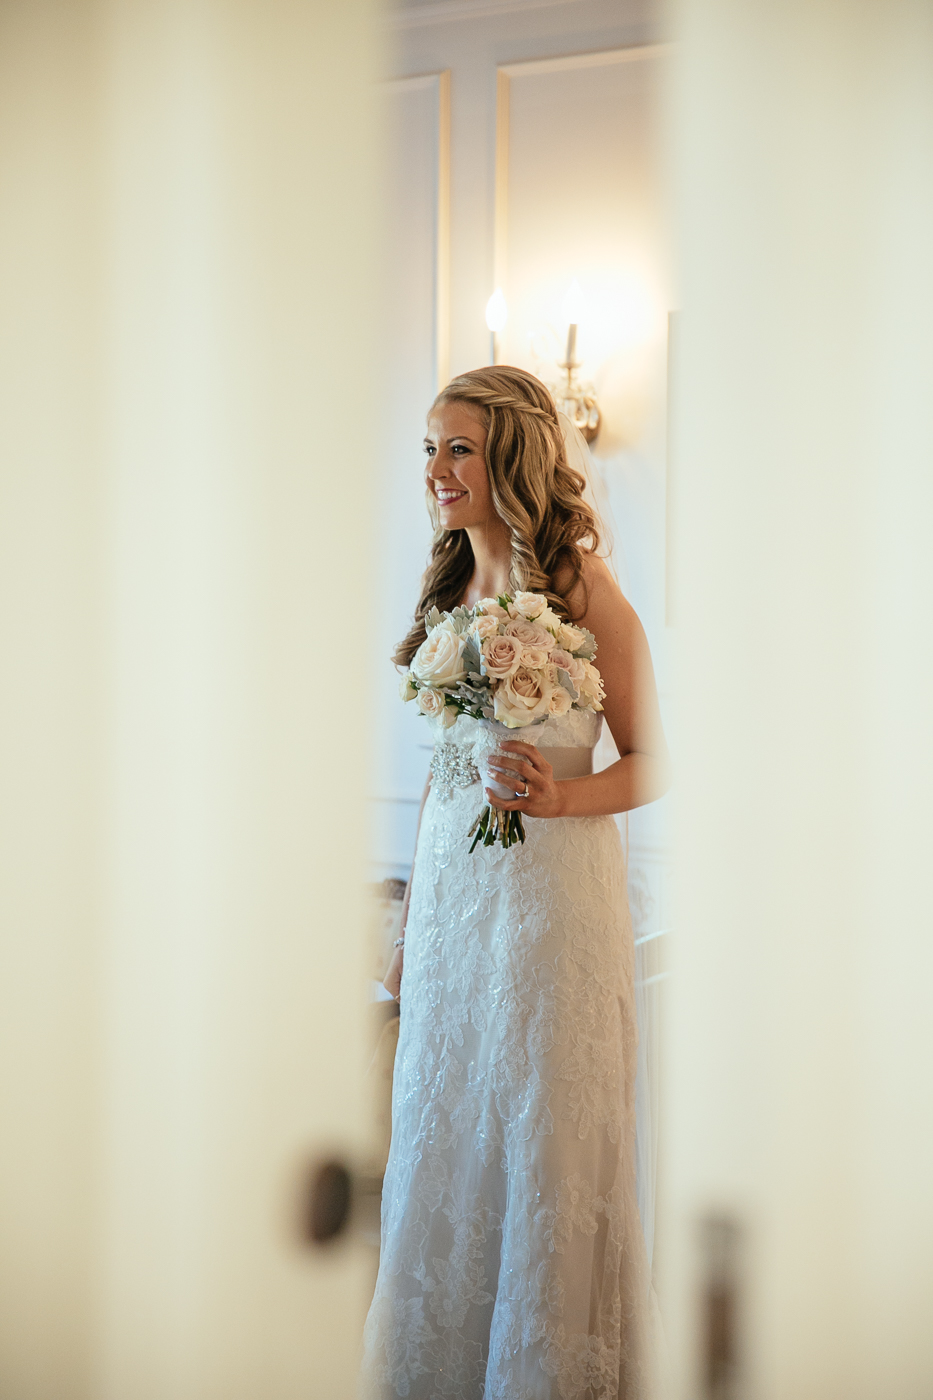 RYAN_&_KELLEY_DARLINGTON_HOUSE_WEDDING_2014_7X9A1951.JPG